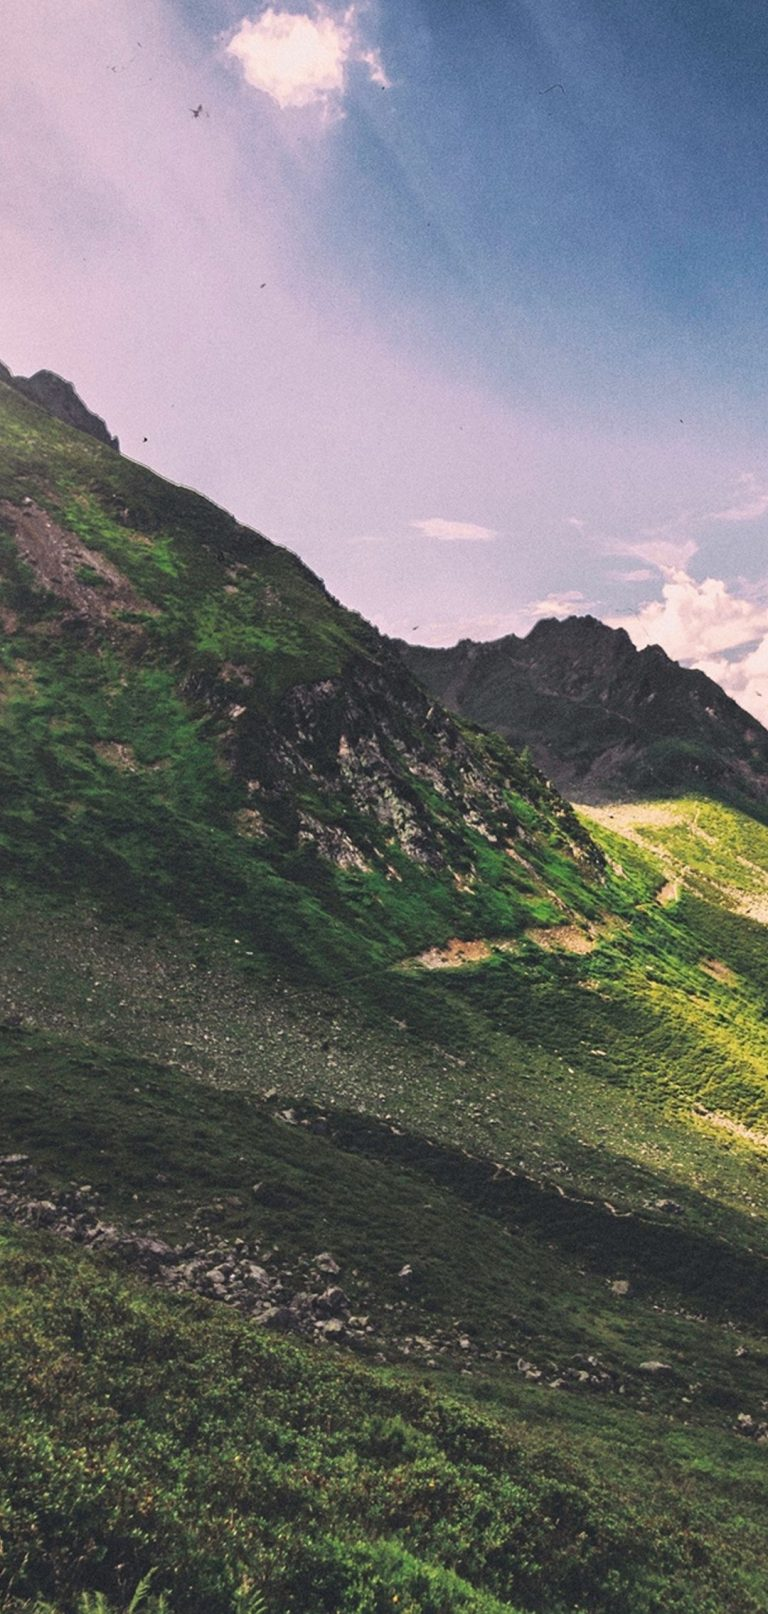 Mountain Panorama Cloud 1080x2270 768x1614